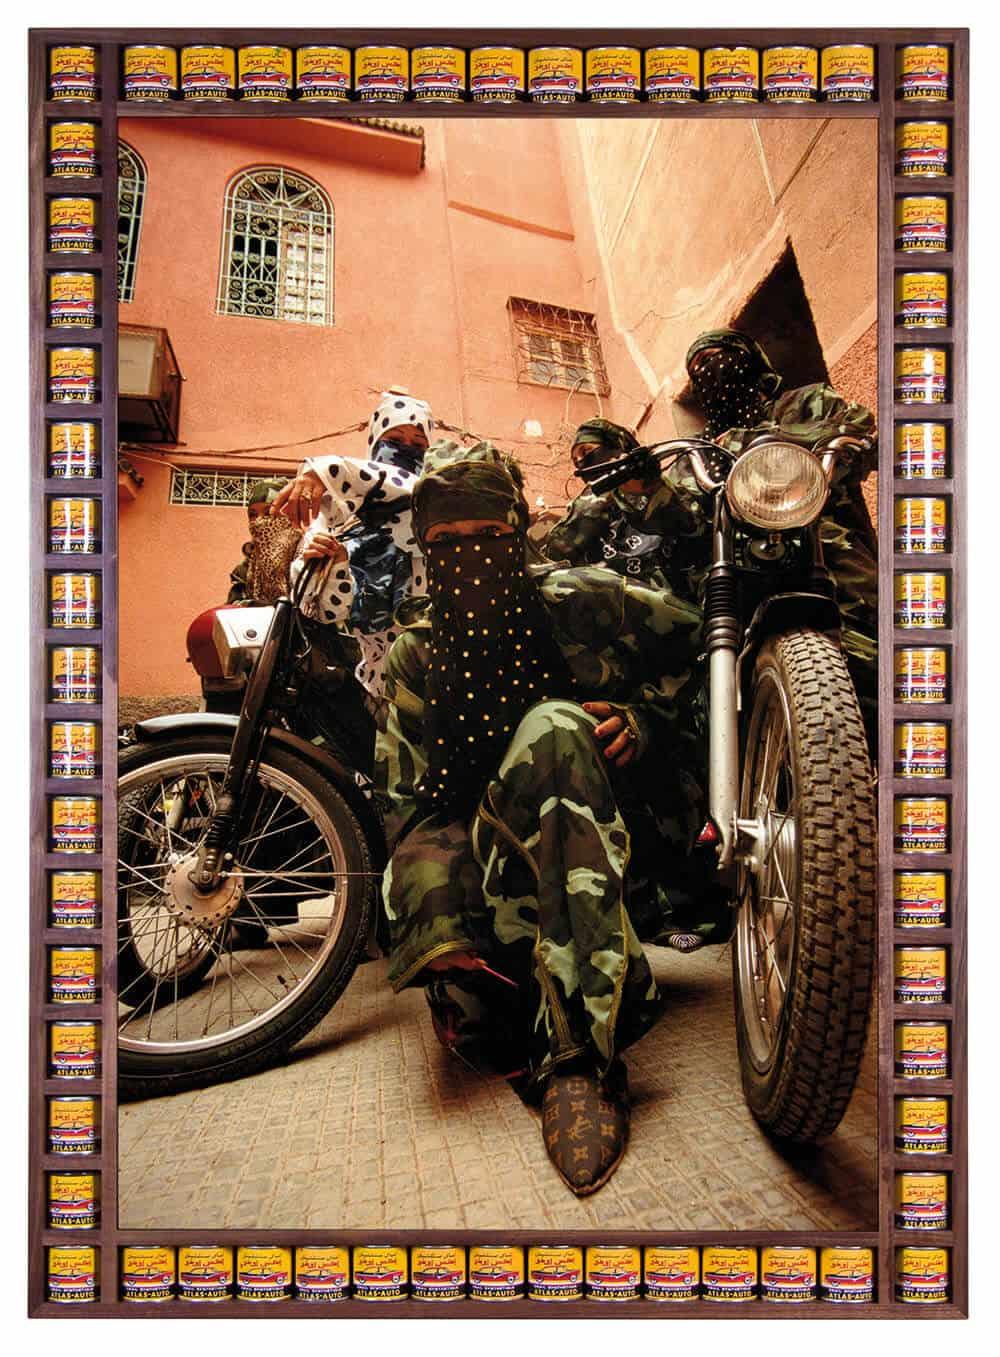 Hassan Hajjaj, Gang Of Marrakesh. © Hassan Hajjaj. Courtesy of the artist and Vigo Gallery.